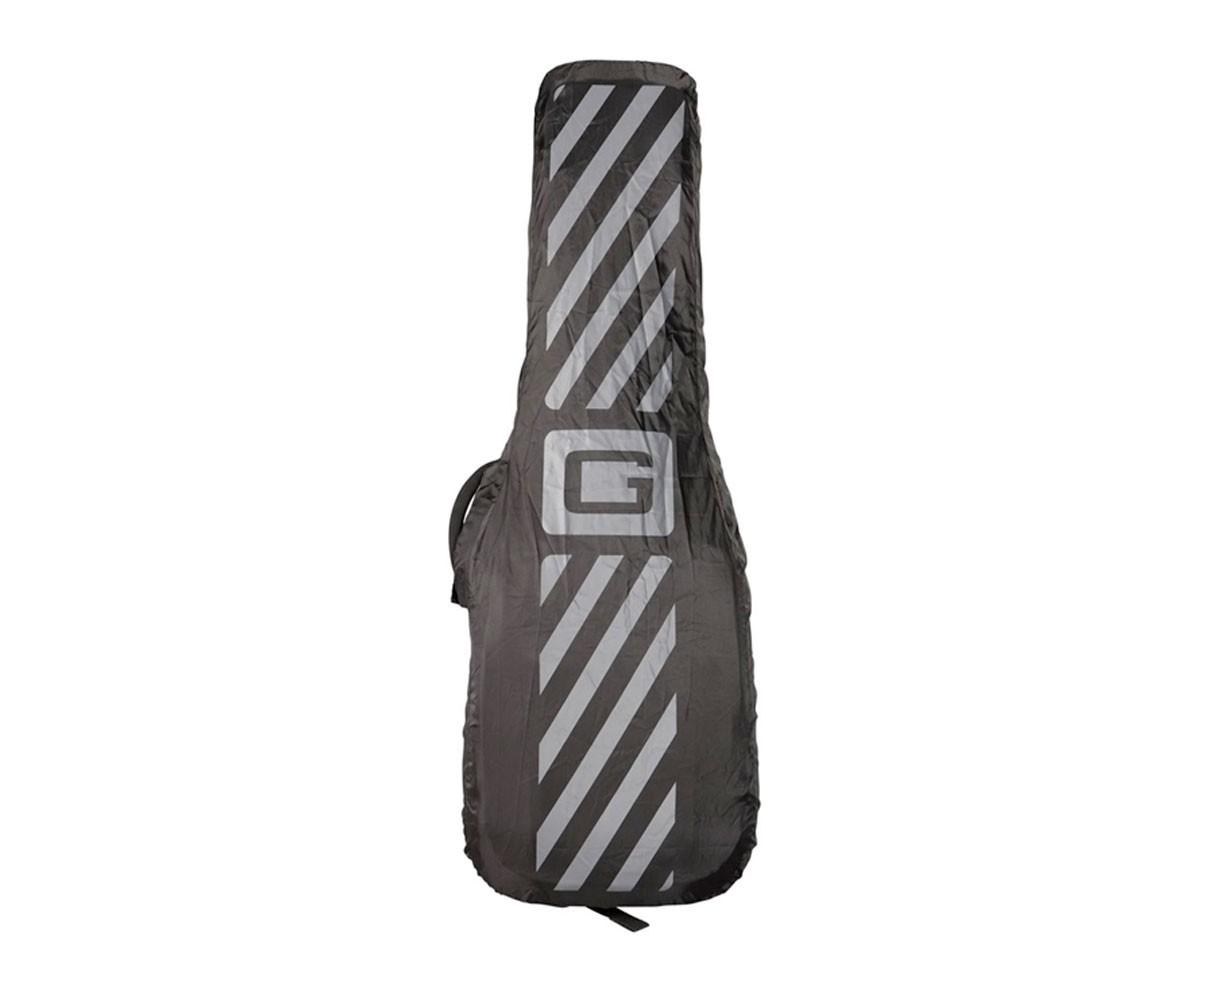 GATOR G-PG